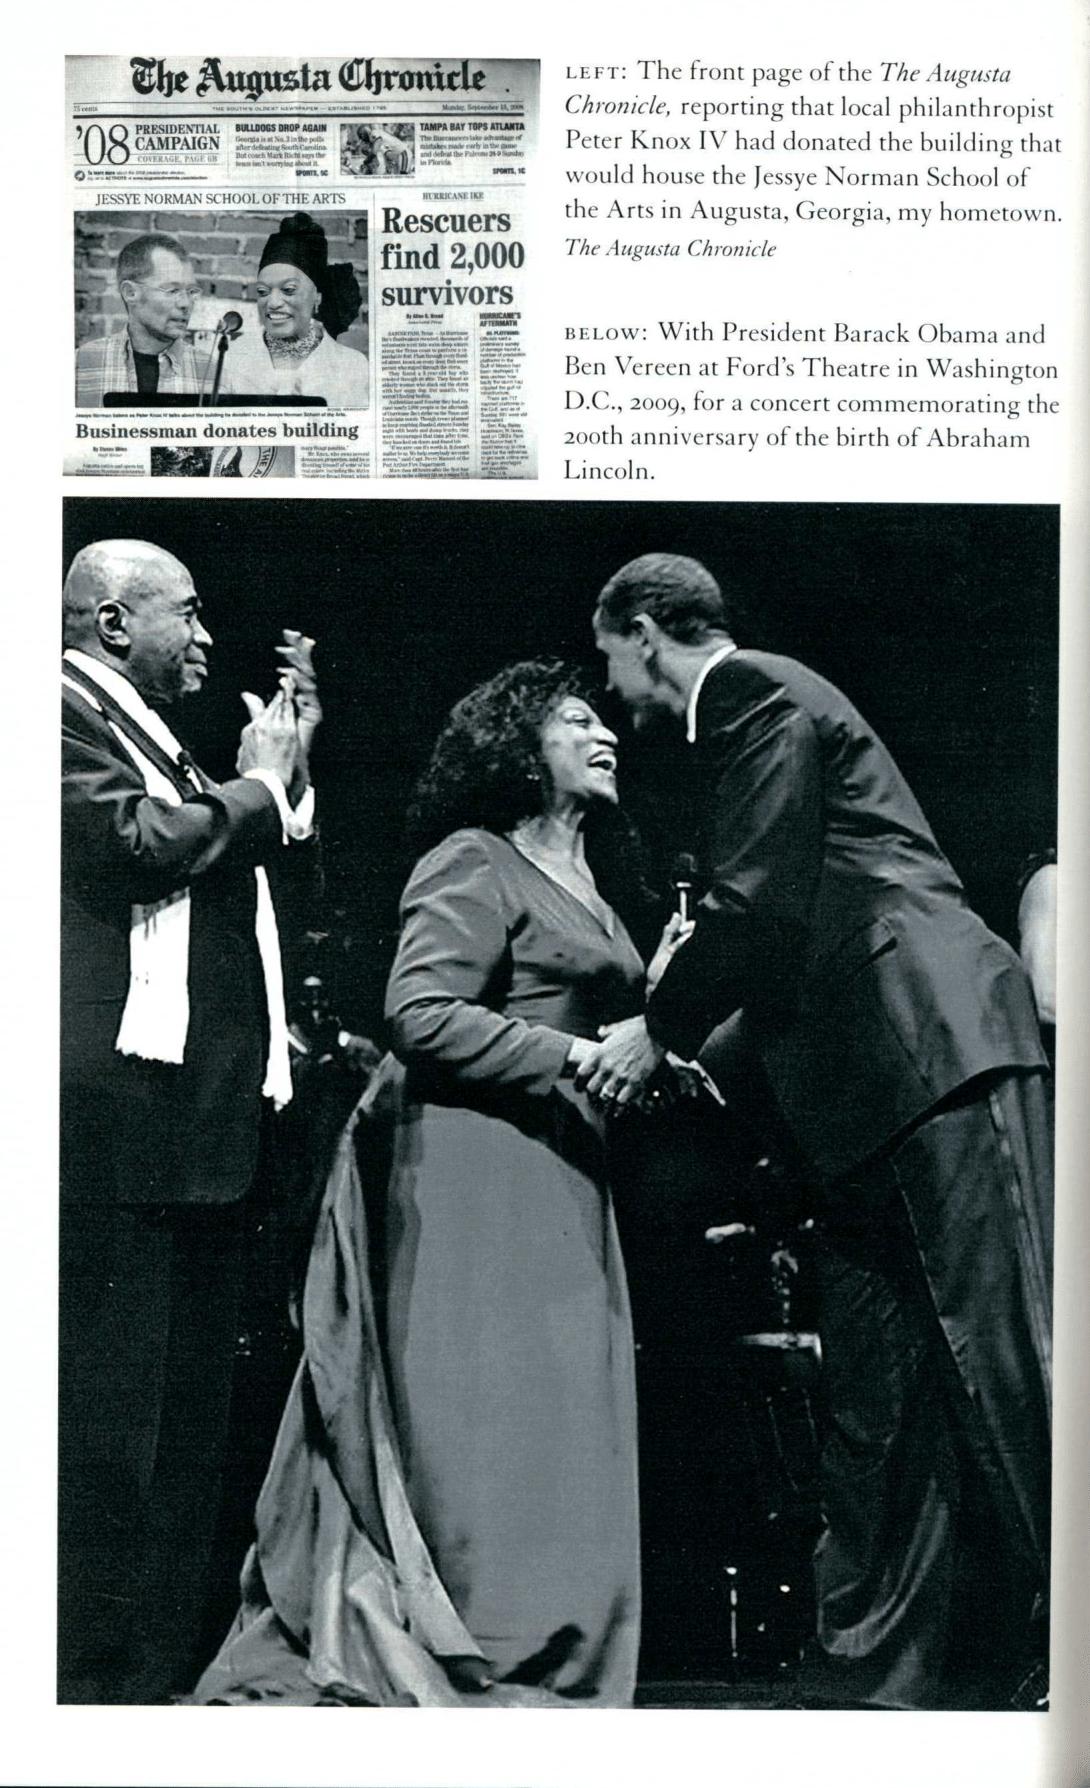 Jessye Norman, Barack Obama, and Ben Vereen